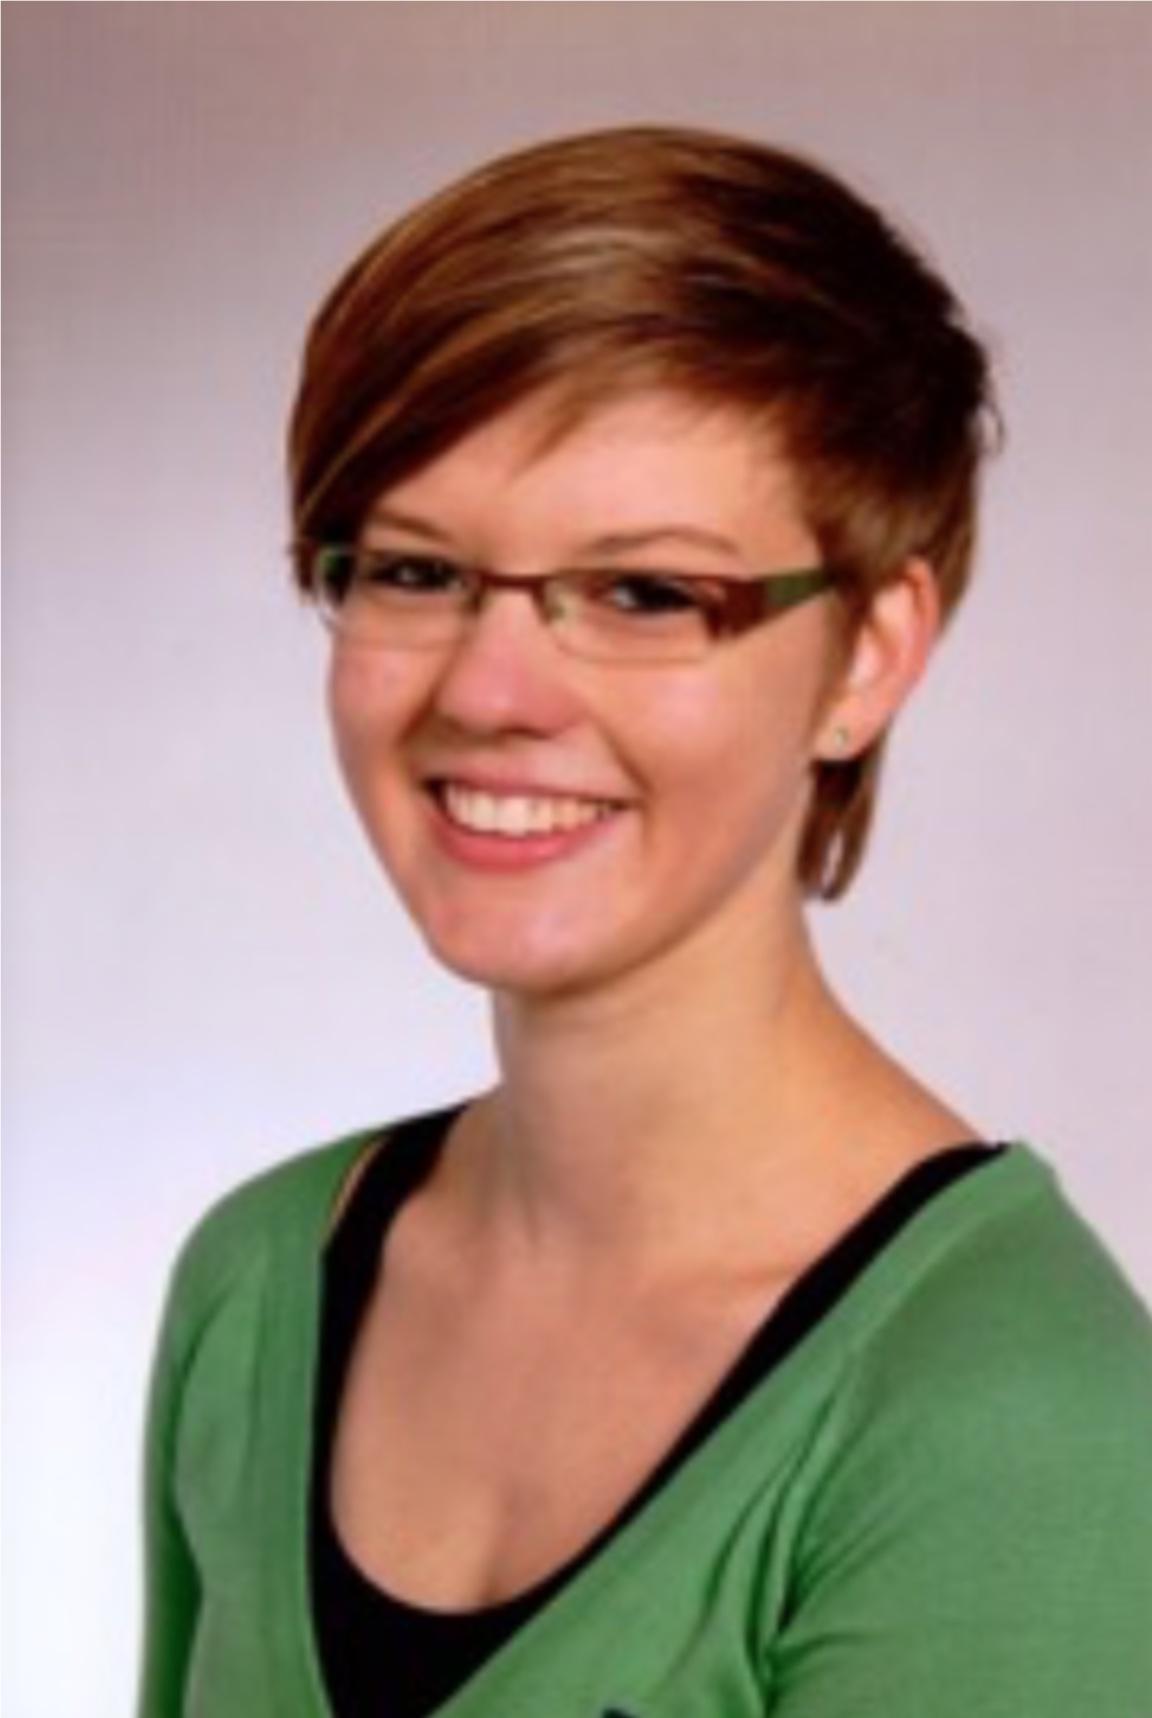 Alina Ehlert